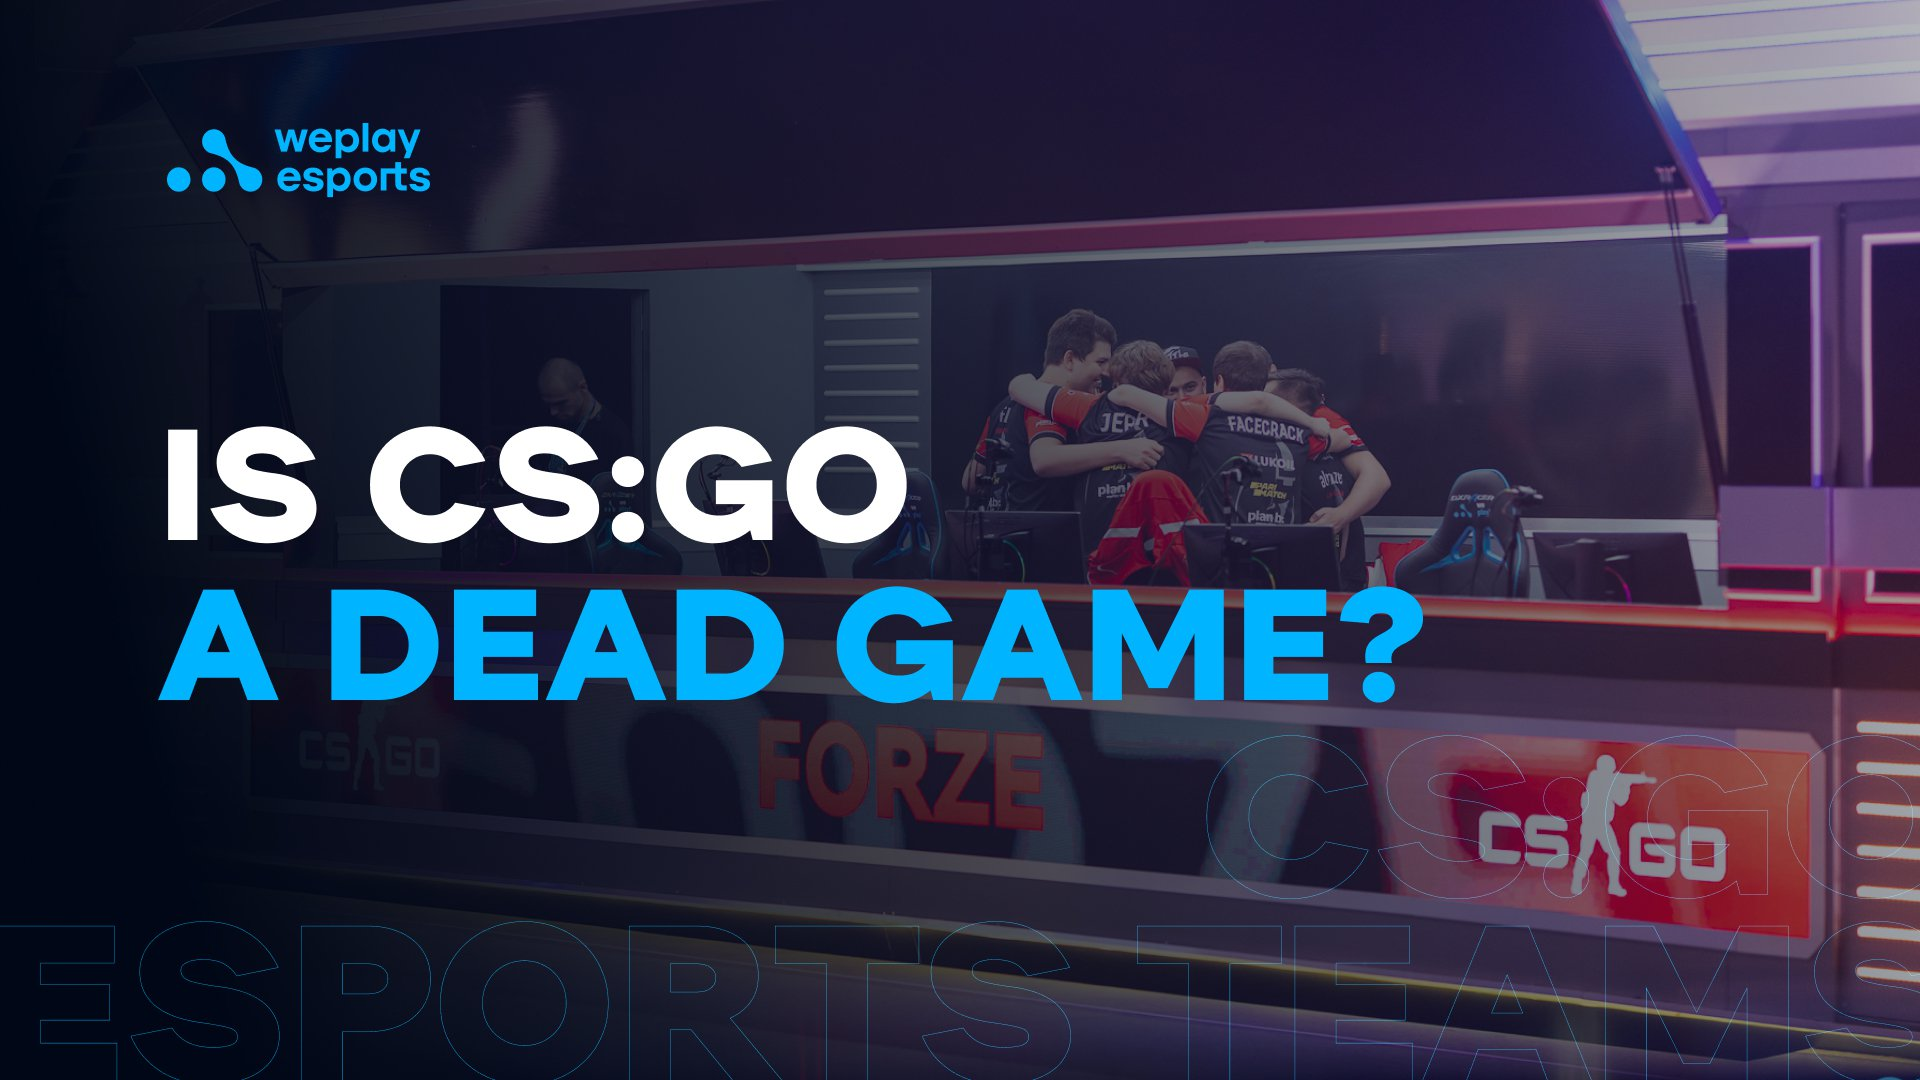 Is CS:GO a Dead Game?